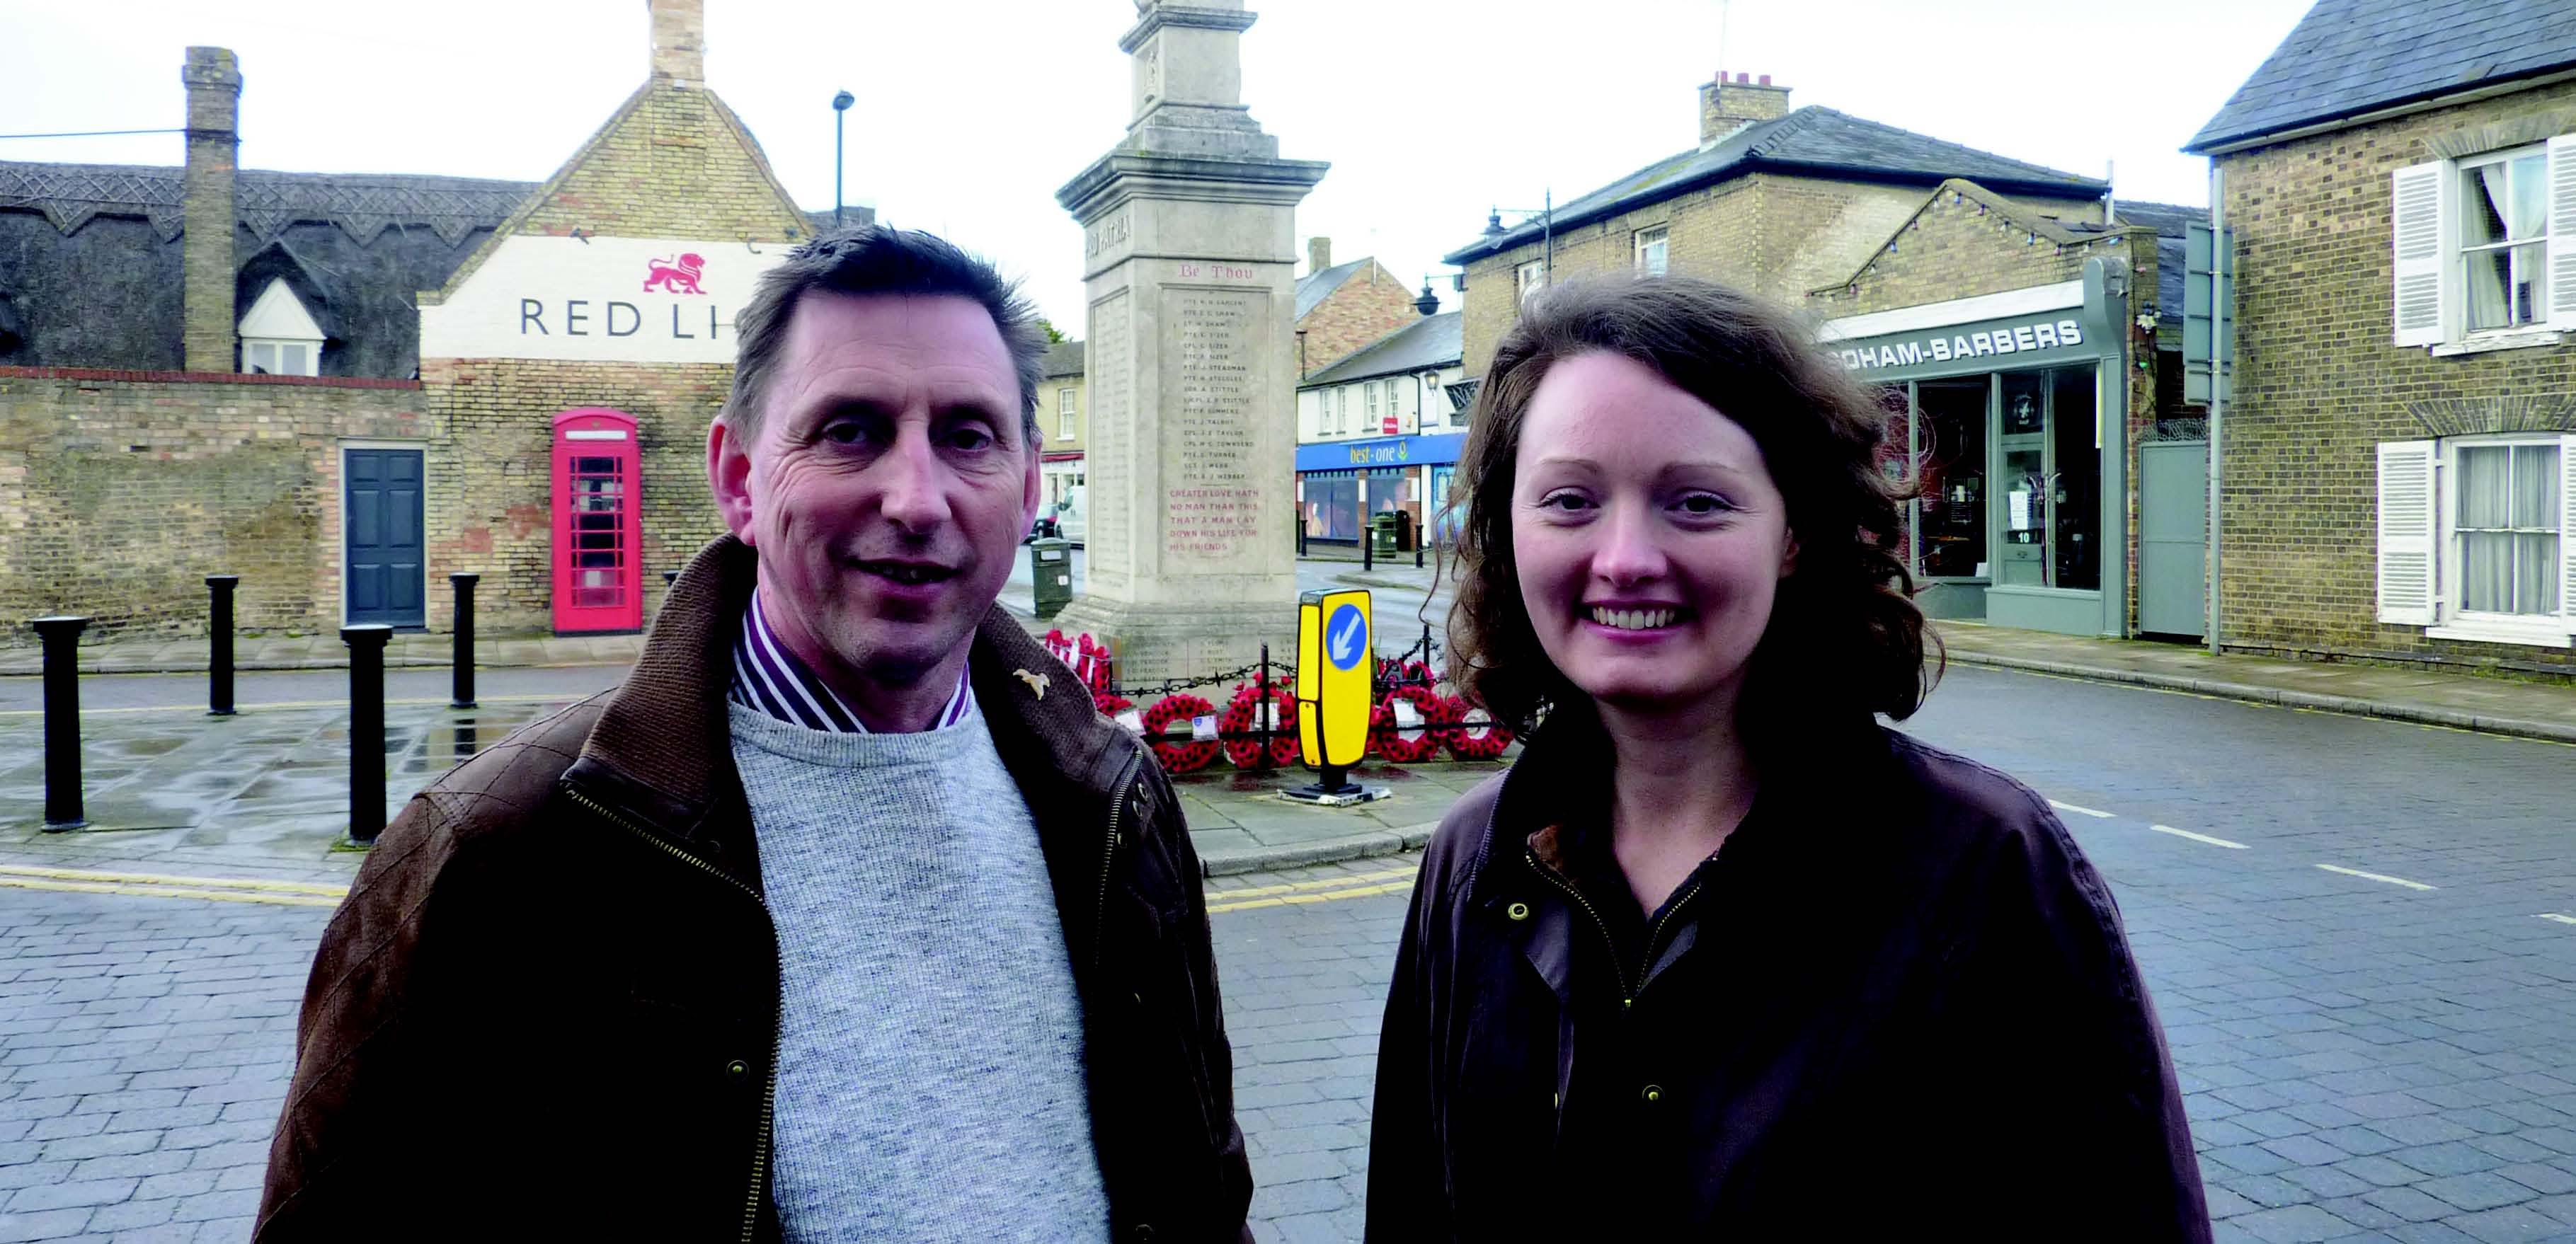 Alec Jones and Victoria Charlesworth Your Candidates for Soham North